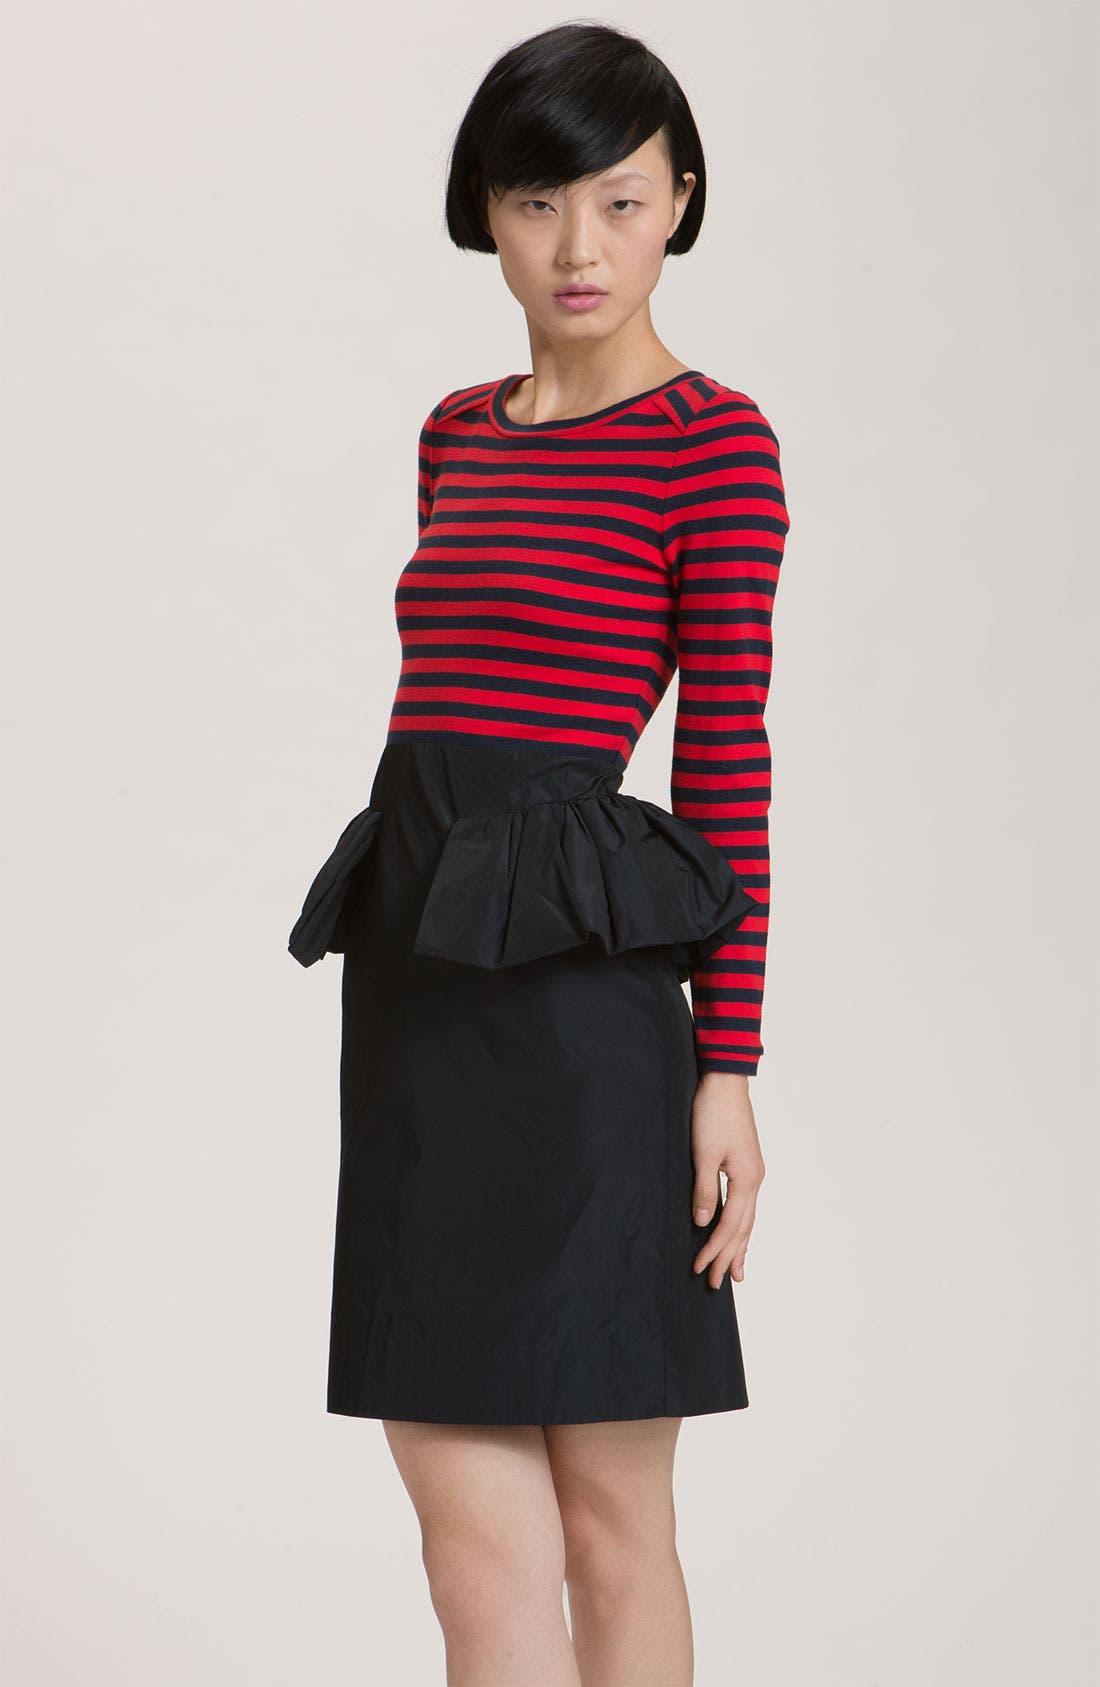 Main Image - MARC BY MARC JACOBS 'Ellsworth' Striped Peplum Dress